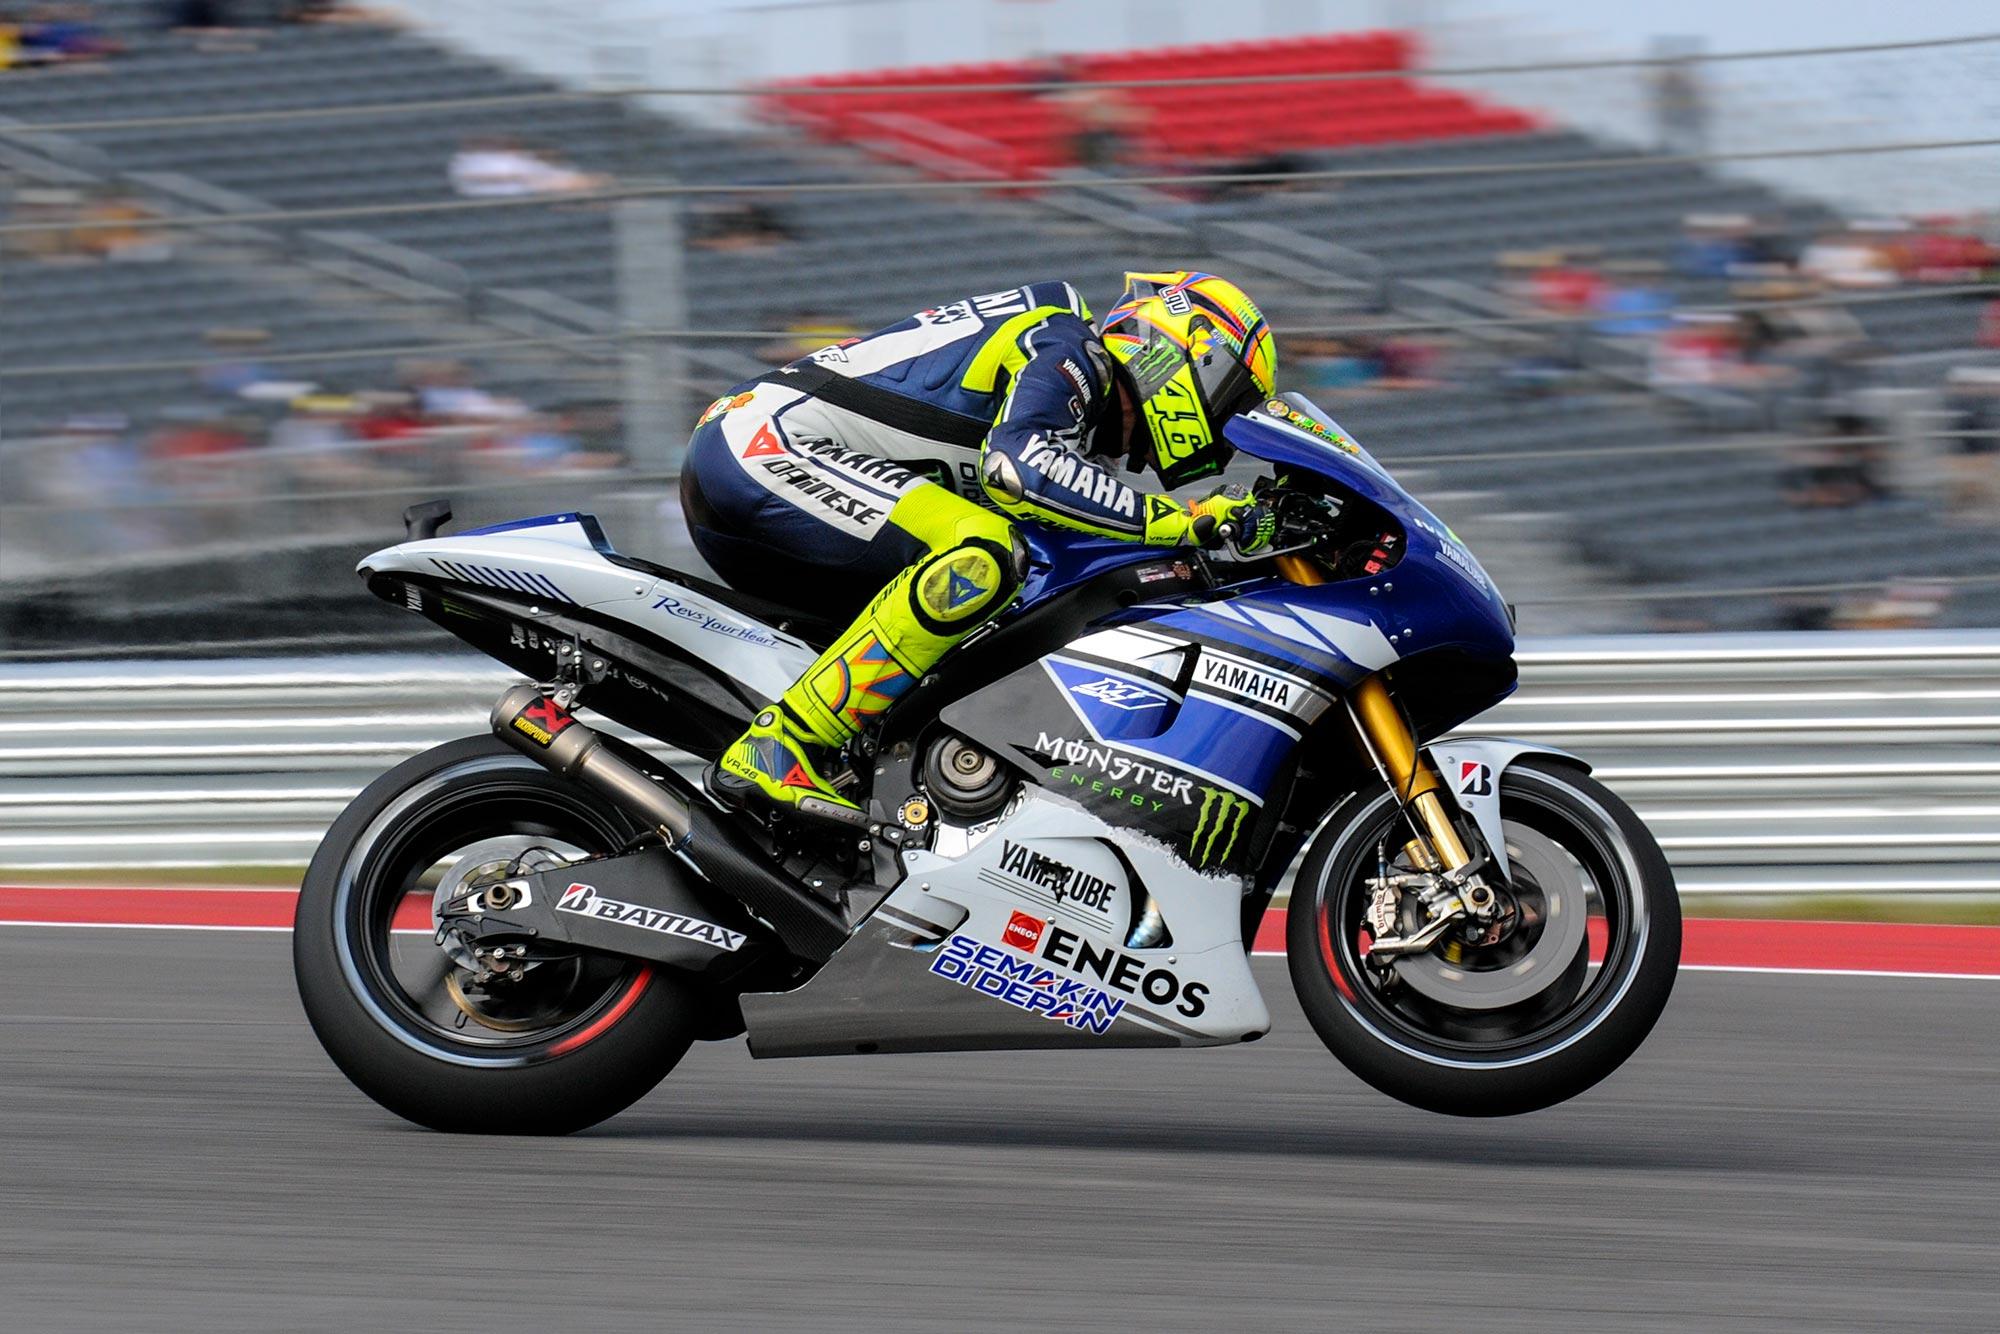 Up Close with the 2013 Yamaha YZR M1 Yamaha YZR M1 MotoGP Valentino ...